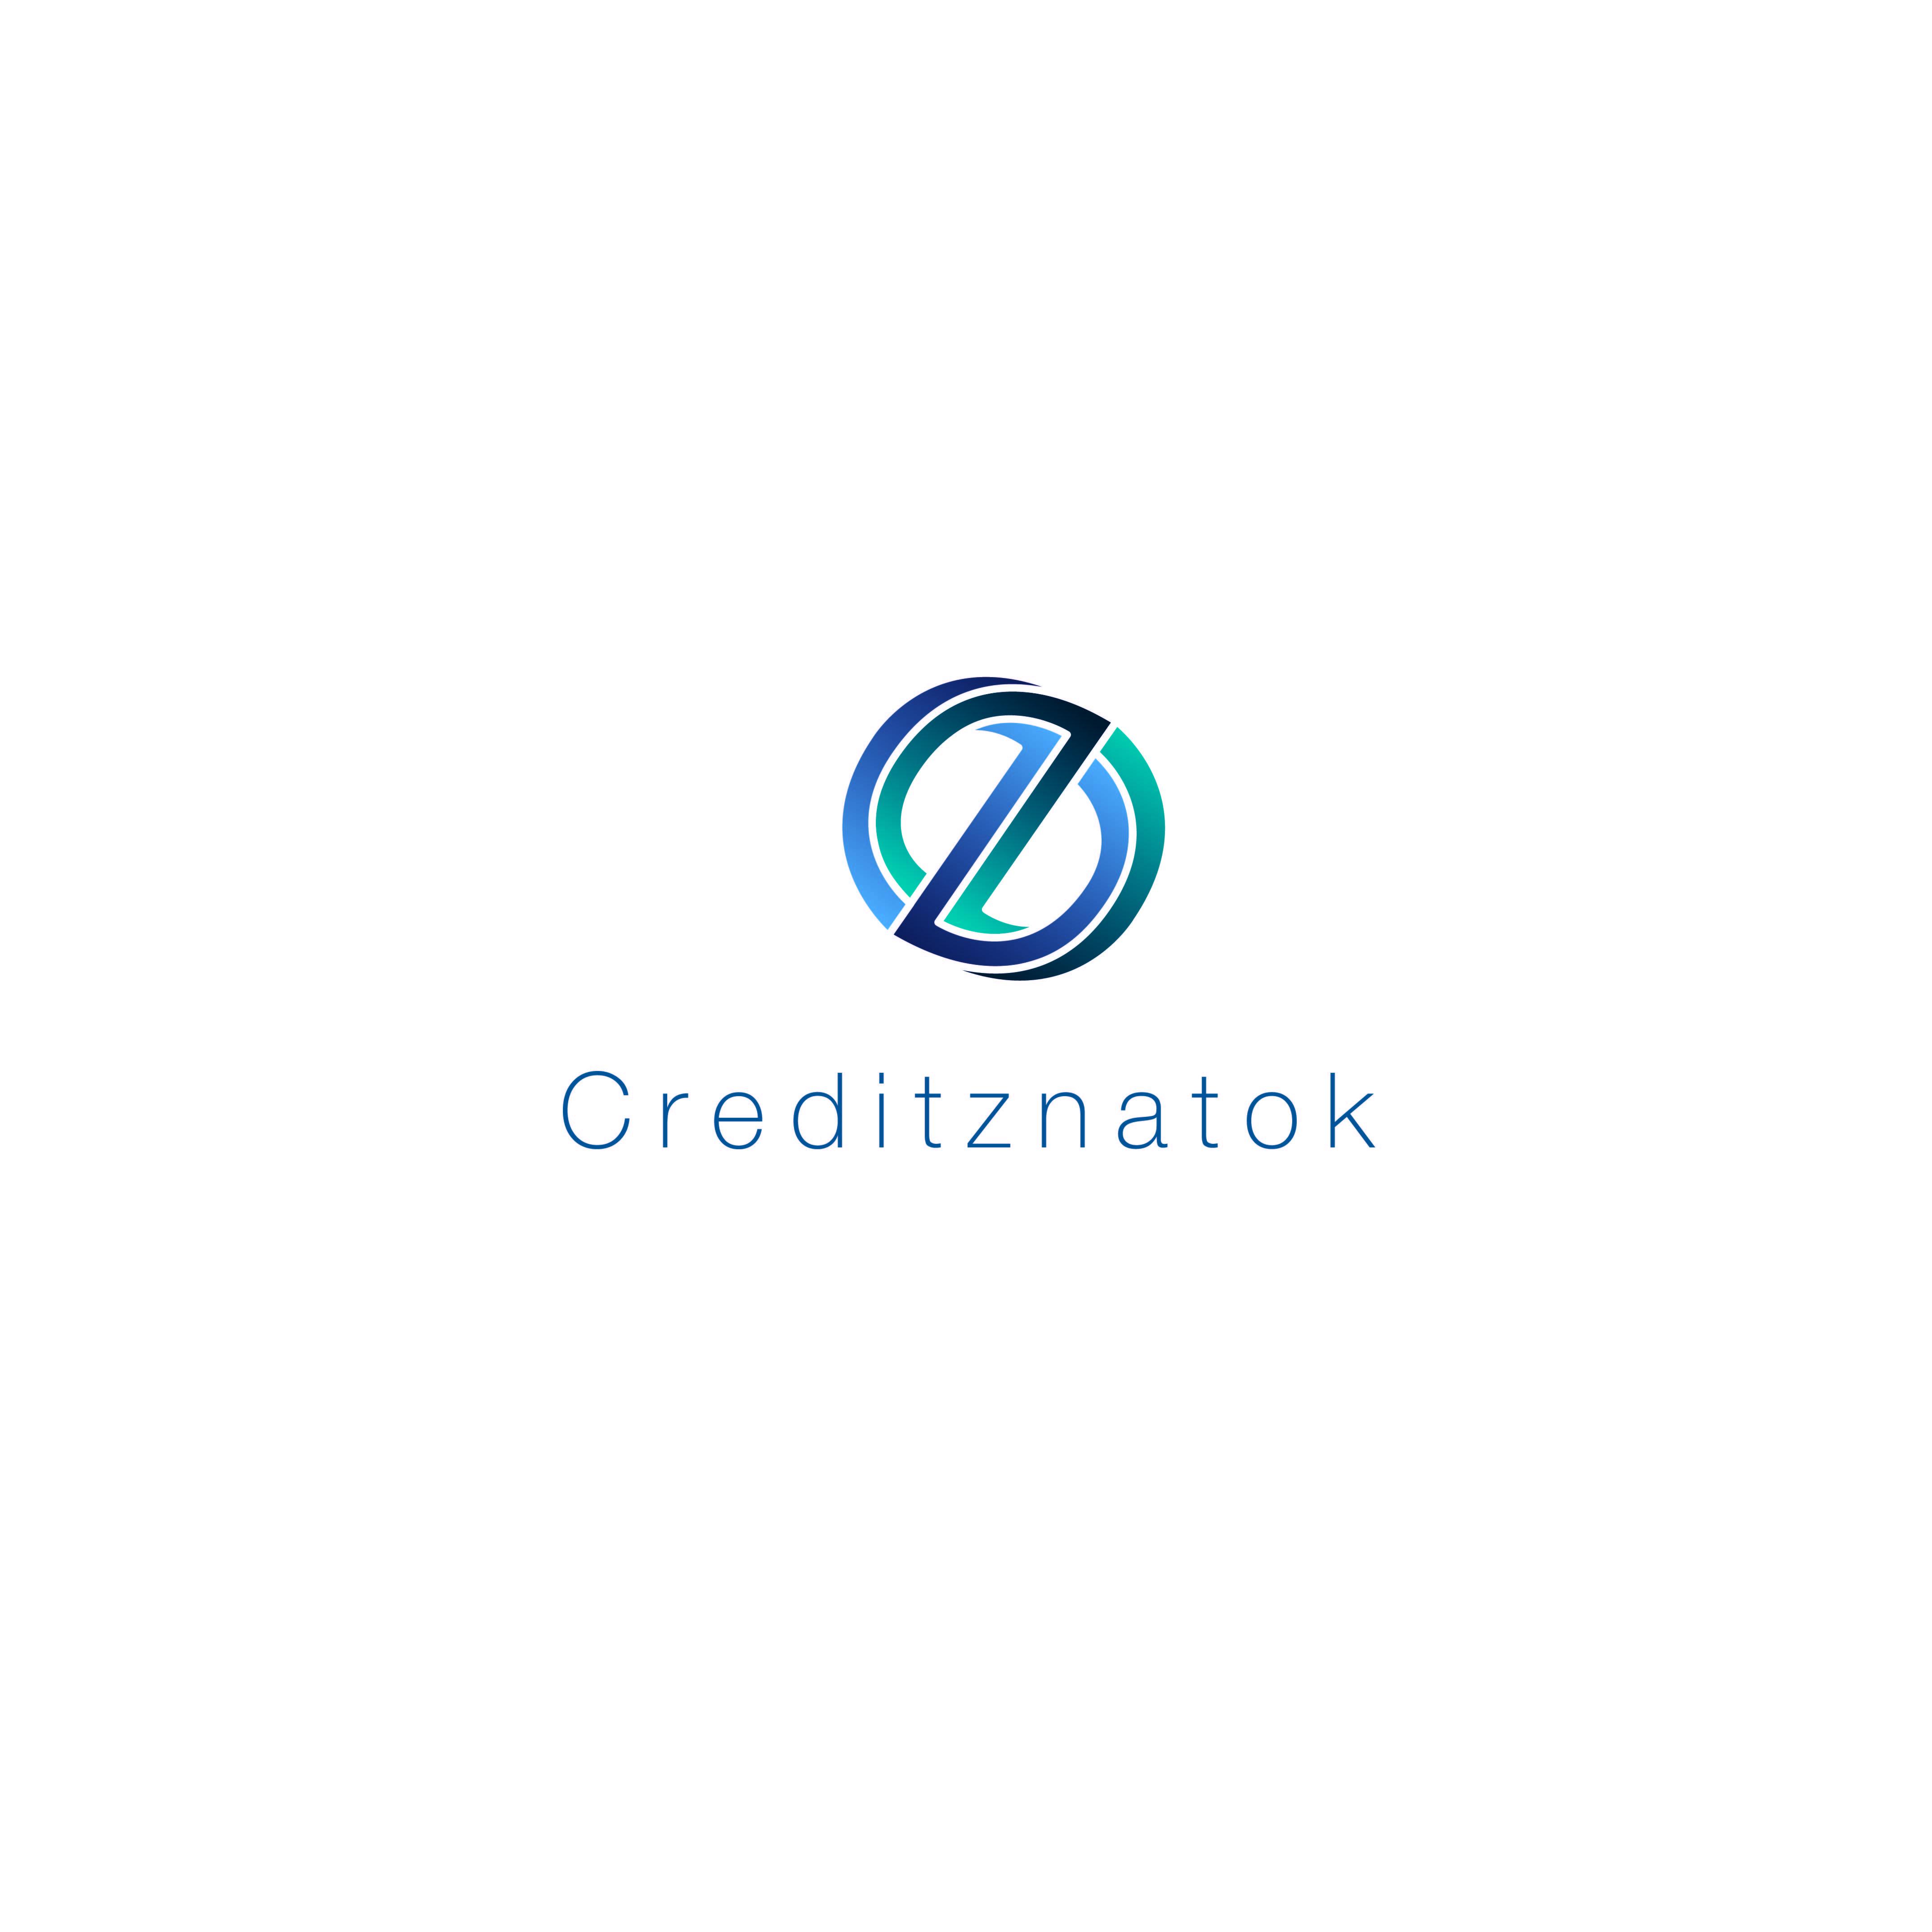 creditznatok.ru - логотип фото f_369589c6b4d54da6.jpg